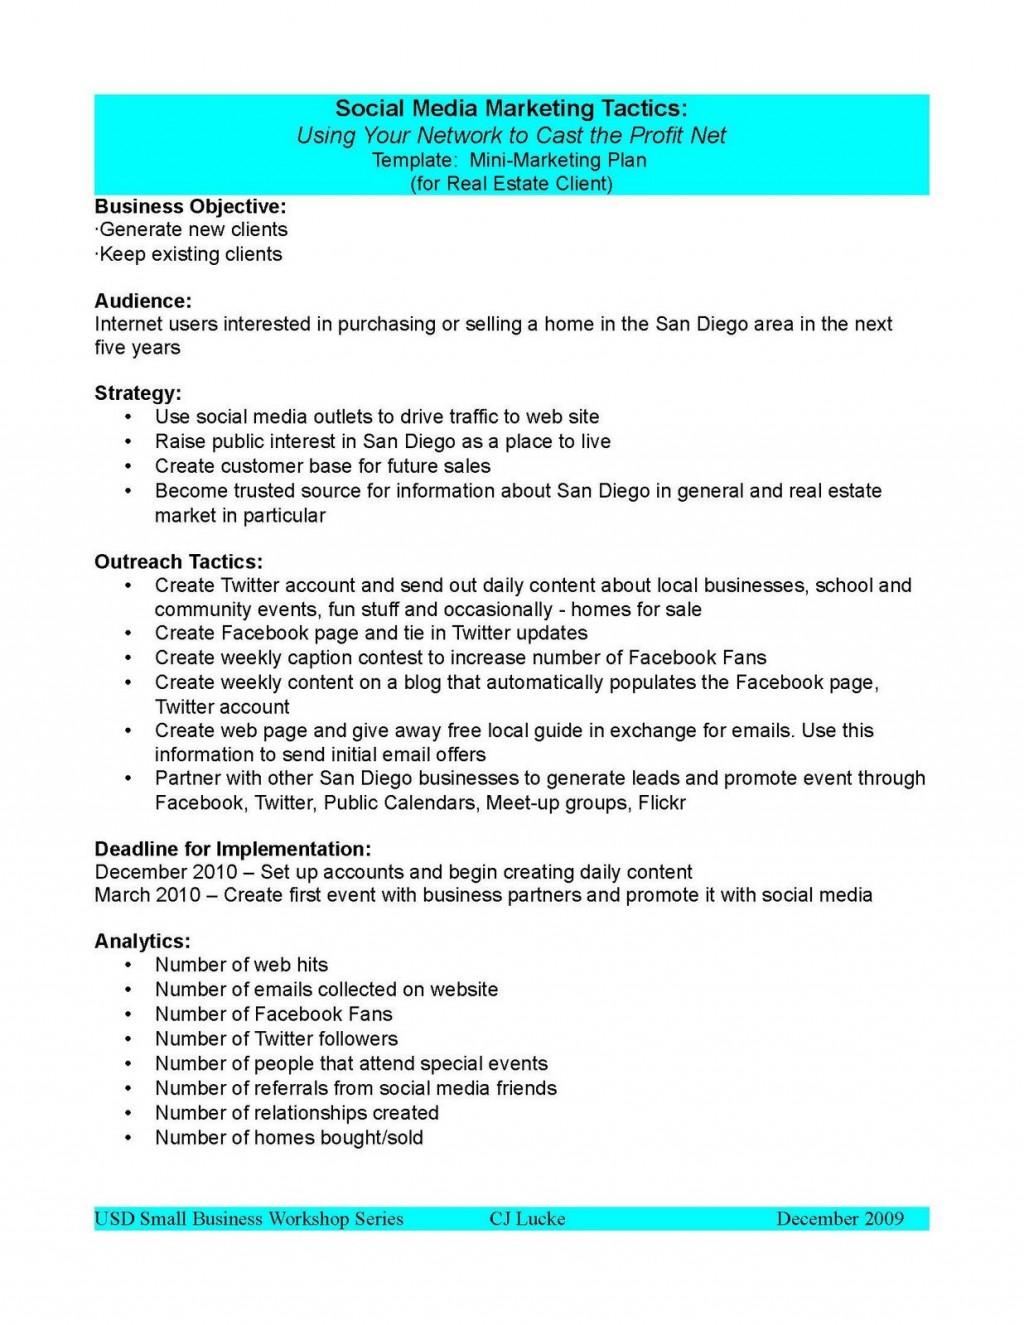 007 Archaicawful Social Media Plan Example Pdf Sample  Template MarketingLarge